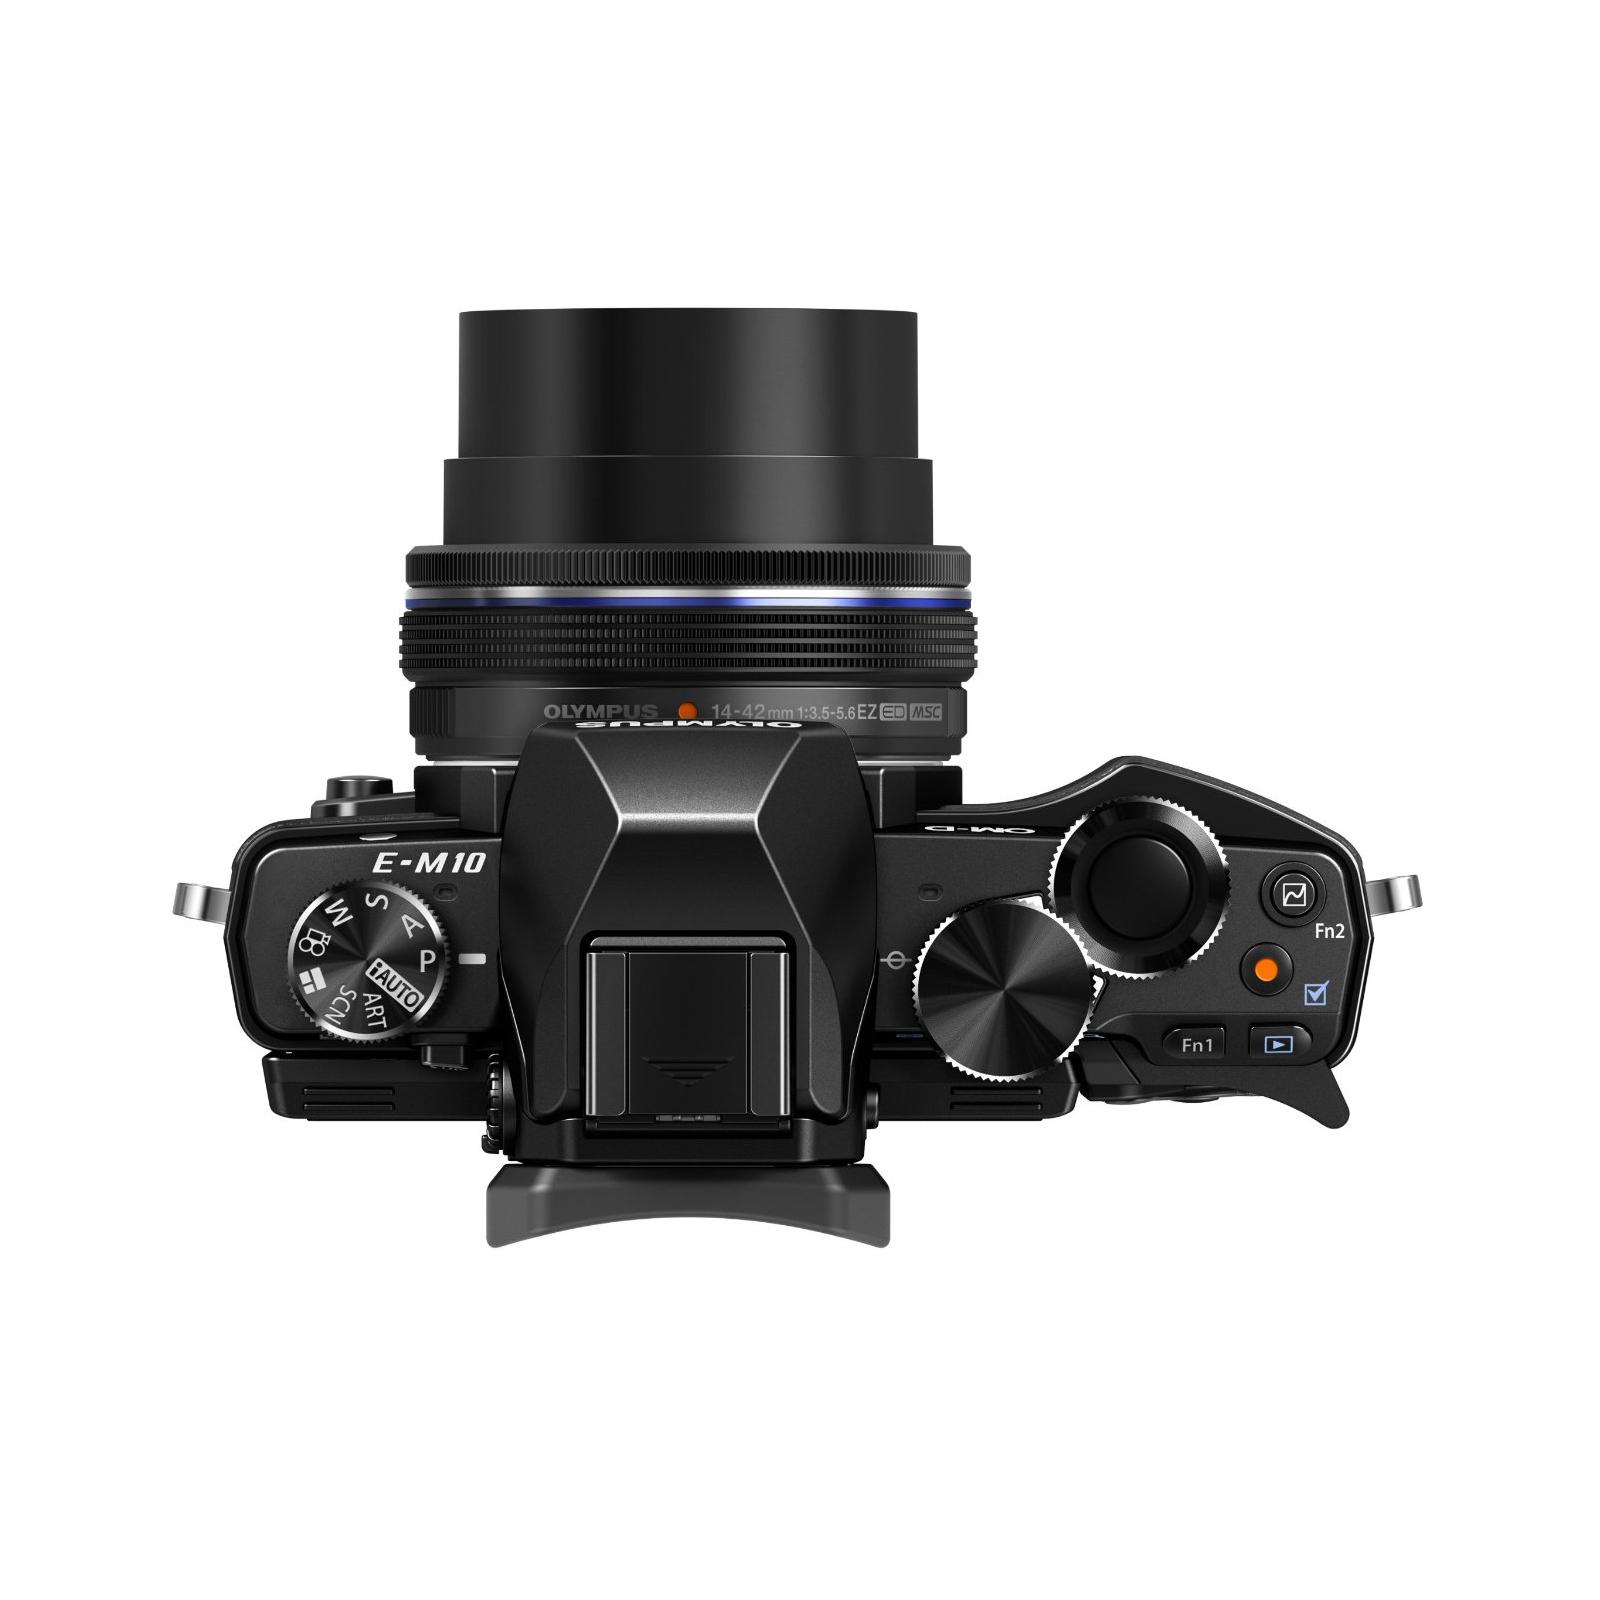 Цифровой фотоаппарат OLYMPUS E-M10 pancake zoom 14-42 Kit black/black (V207023BE000) изображение 7